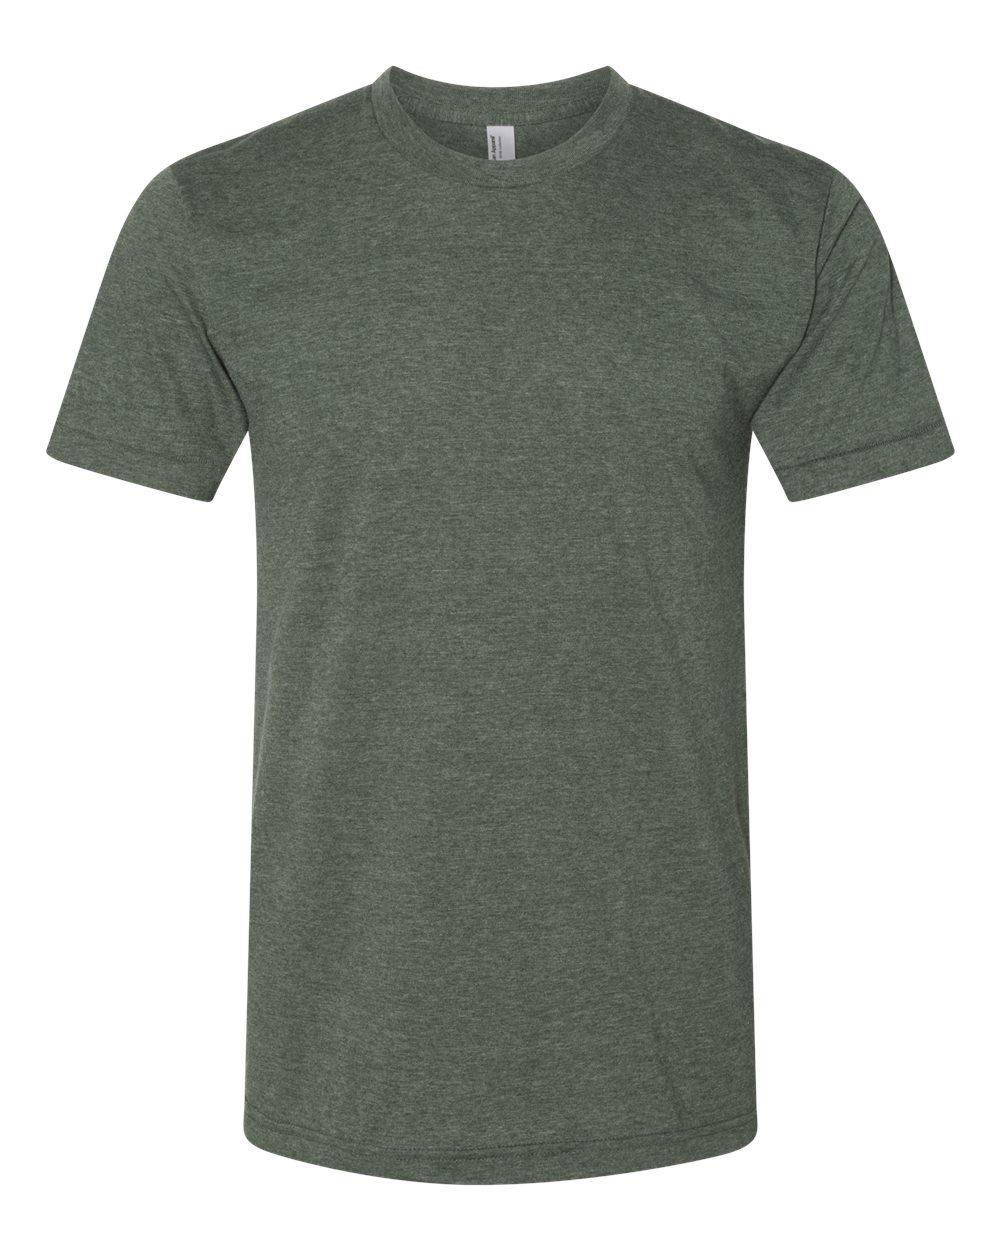 American-Apparel-Mens-Slim-Fit-50-50-Cotton-T-Shirt-Tee-BB401W-up-to-2XL thumbnail 18